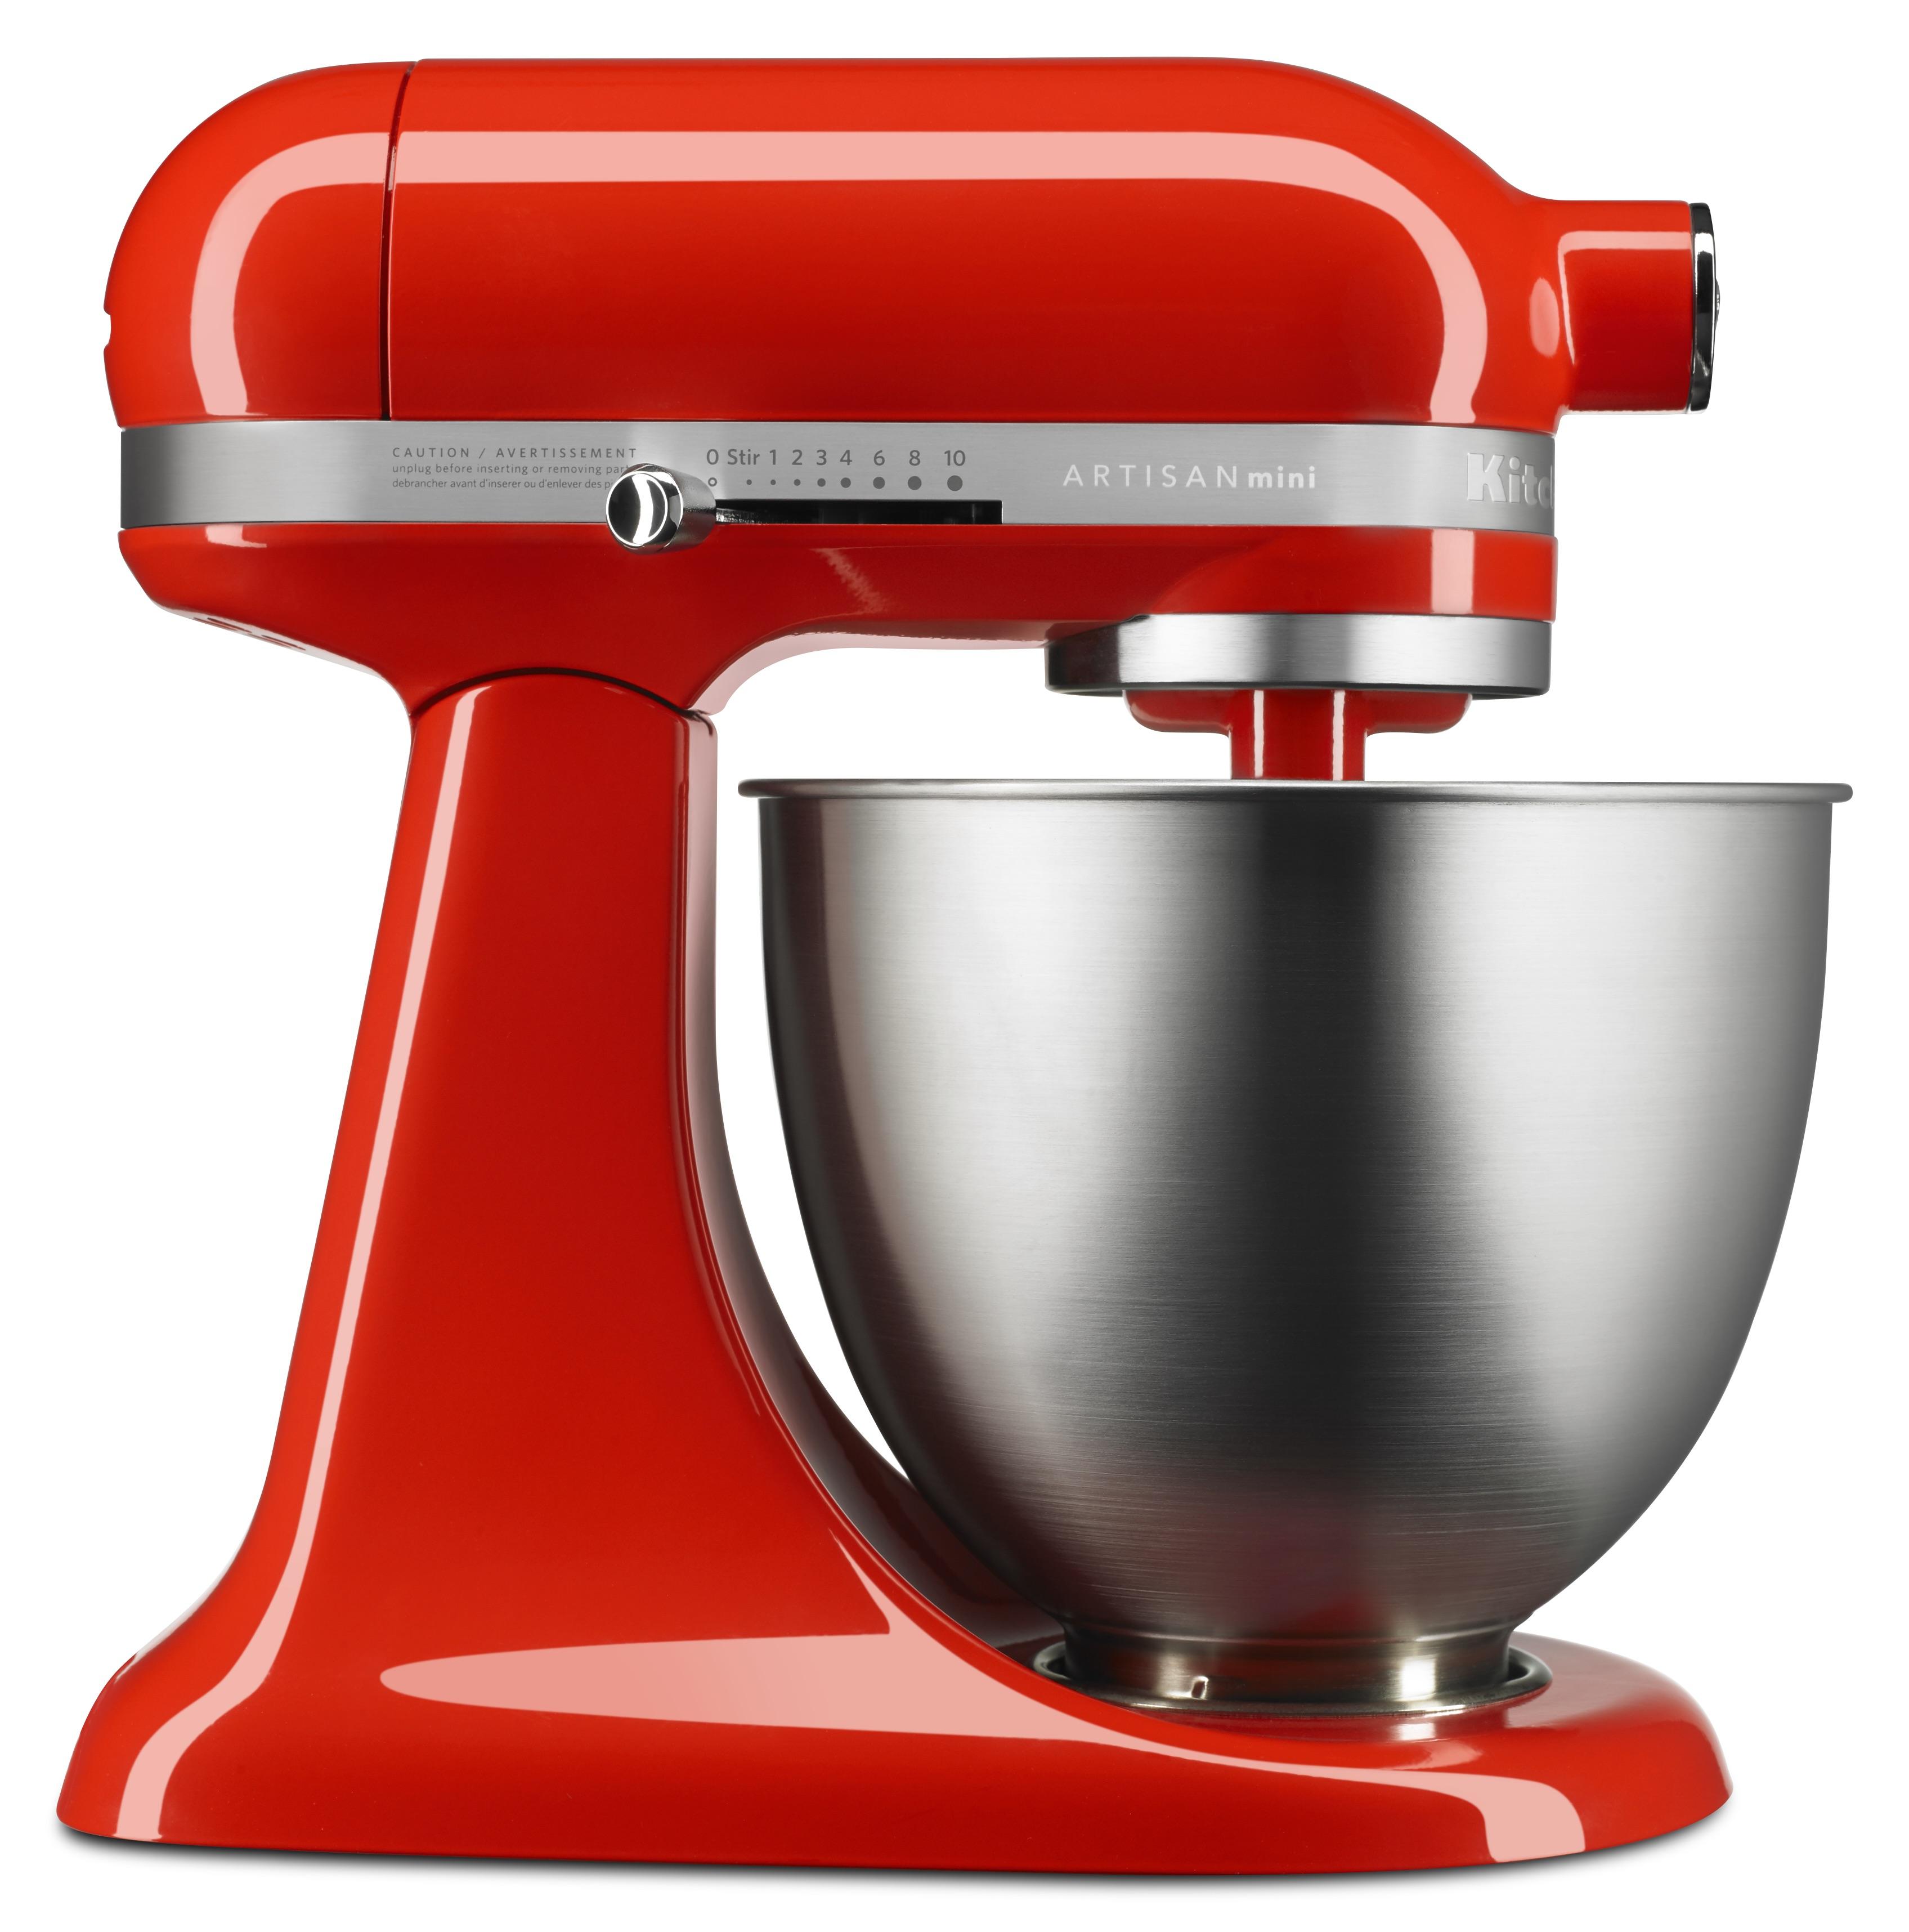 kitchenaid-artisan-mini-stand-mixer-in-hot-sauce